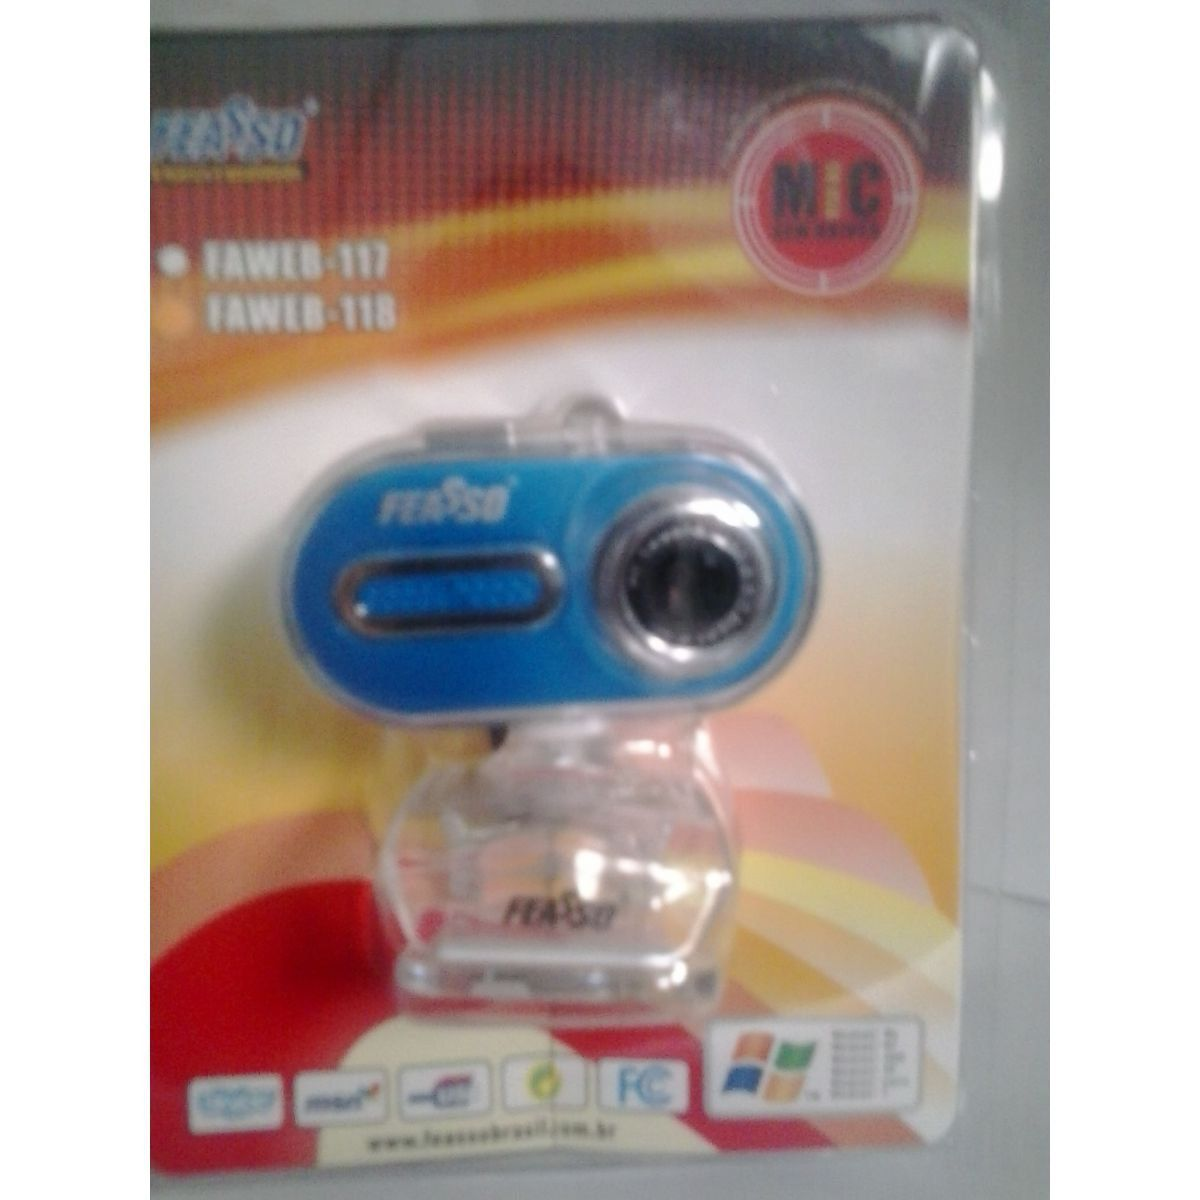 Webcam 1.3m Feasso Faweb118 Rosa